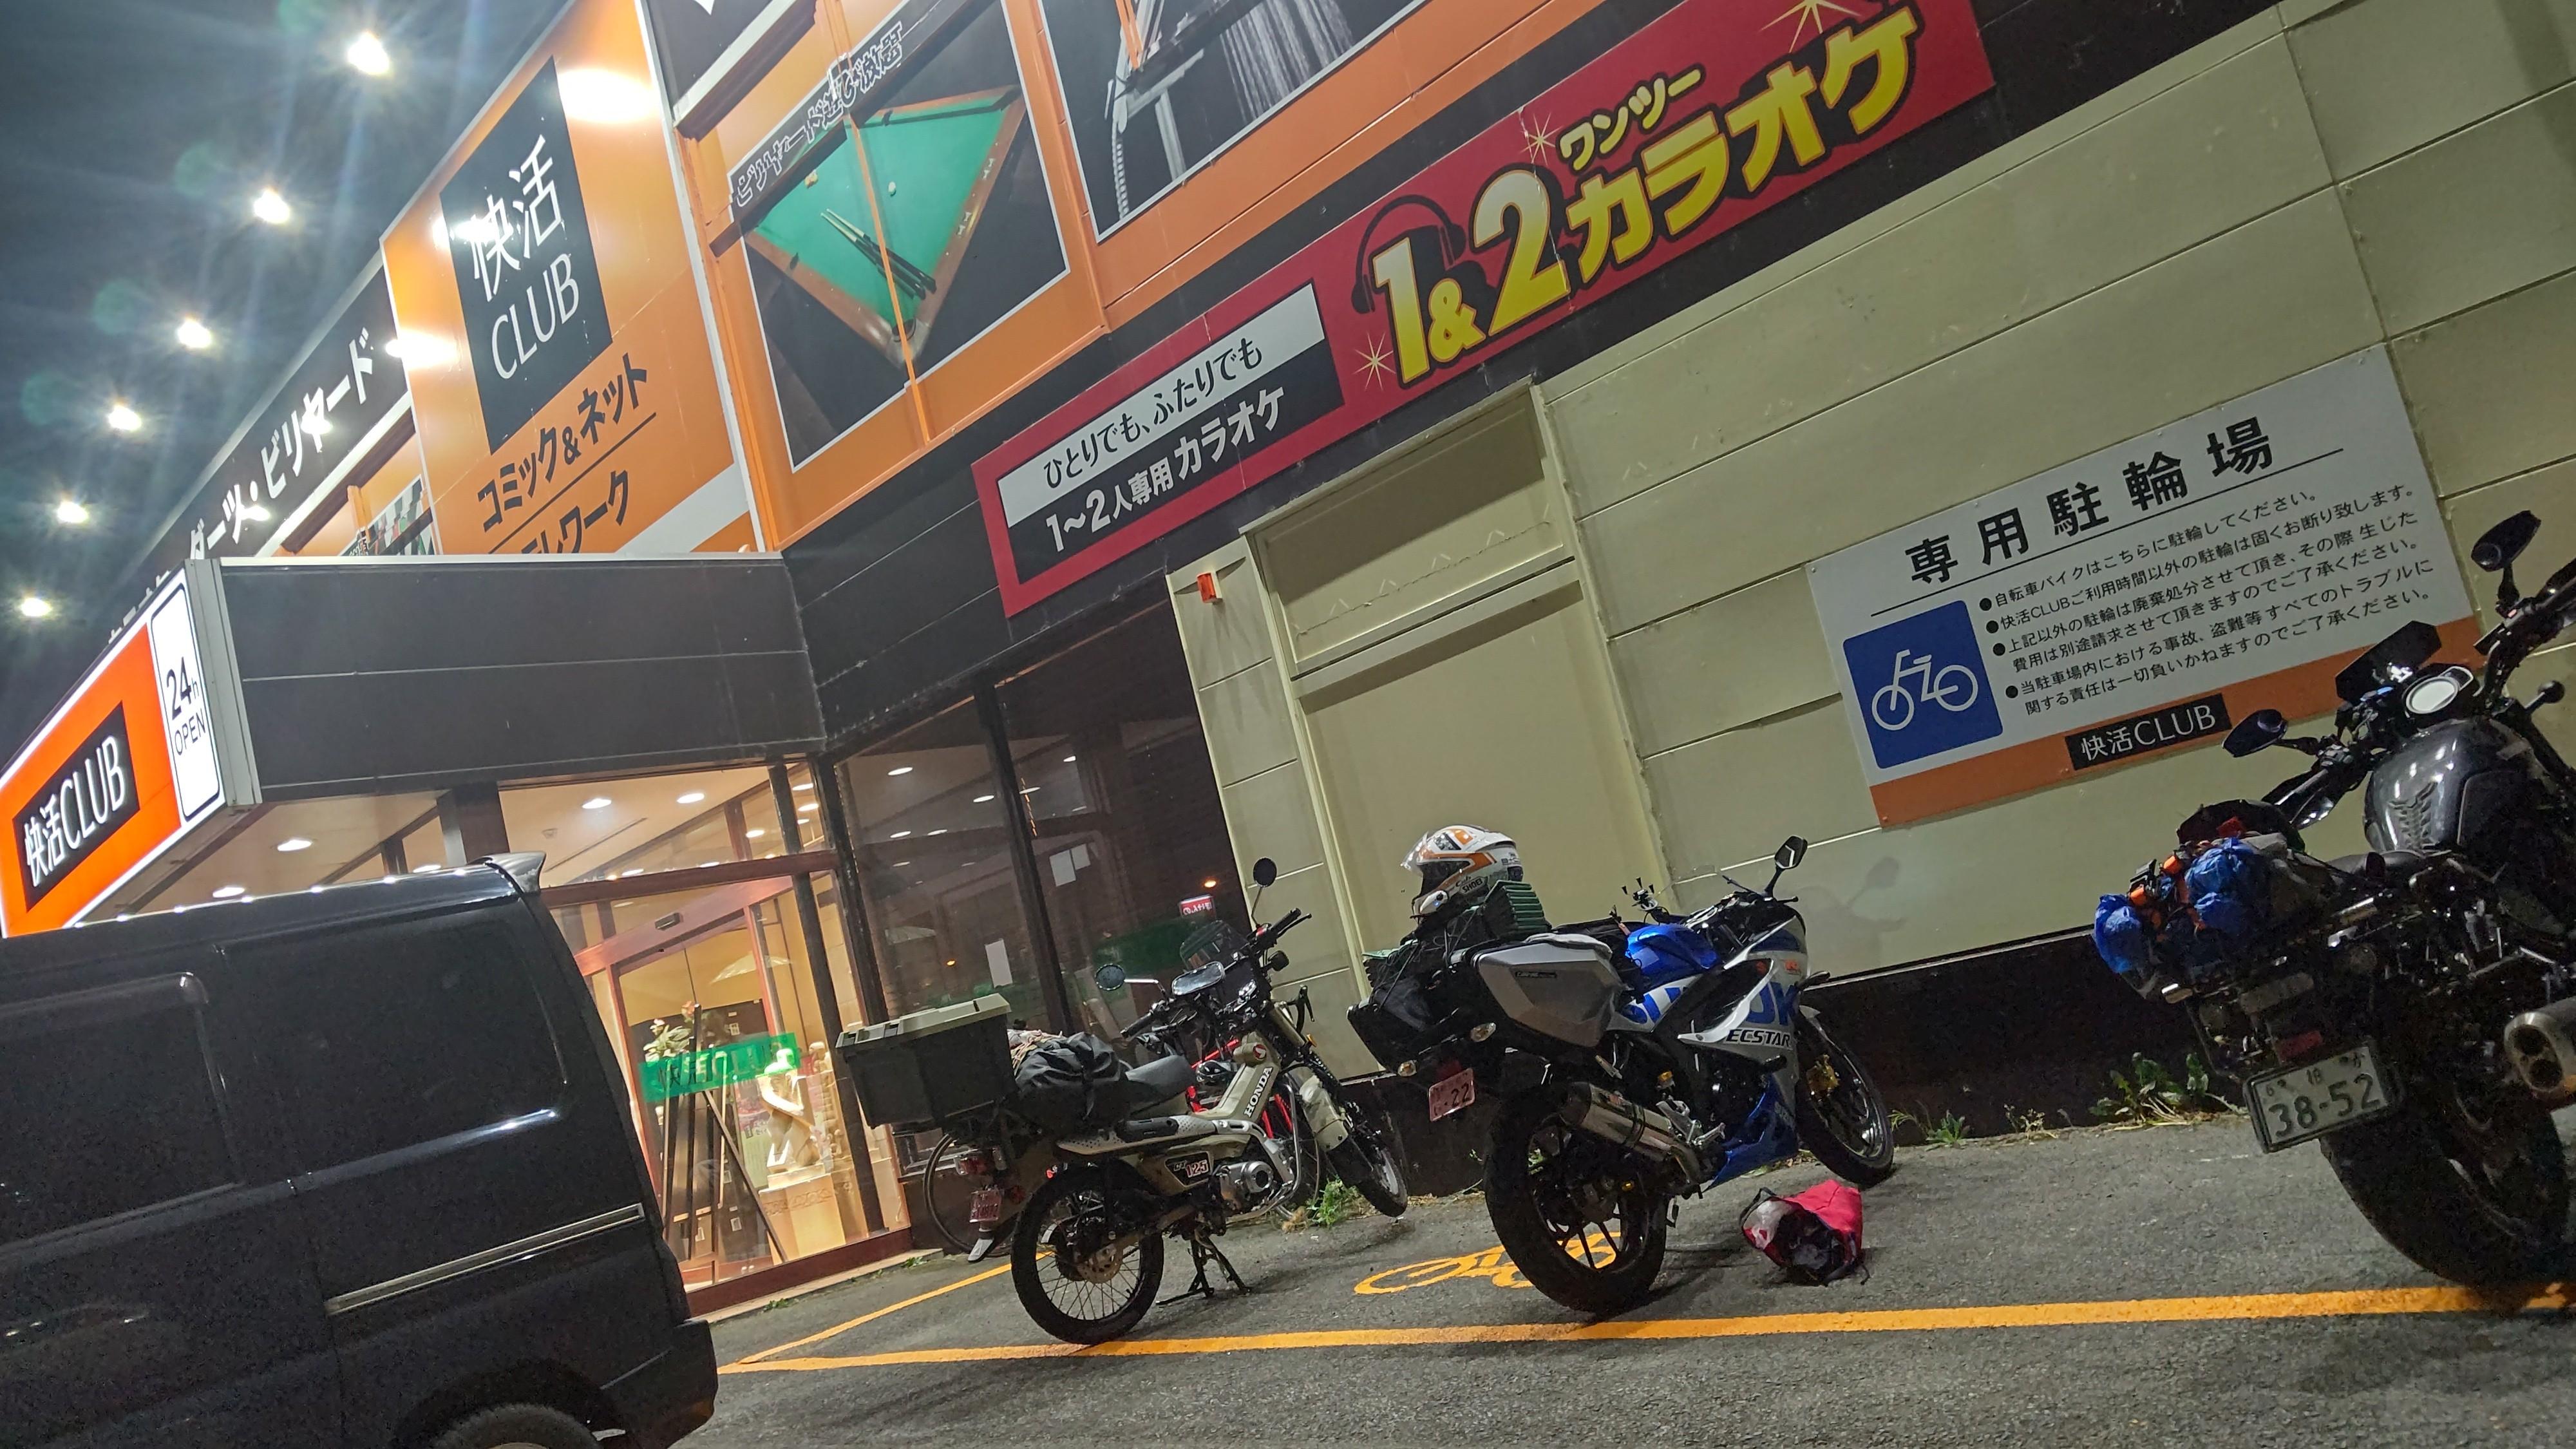 f:id:Tsubasaba:20210816034157j:image